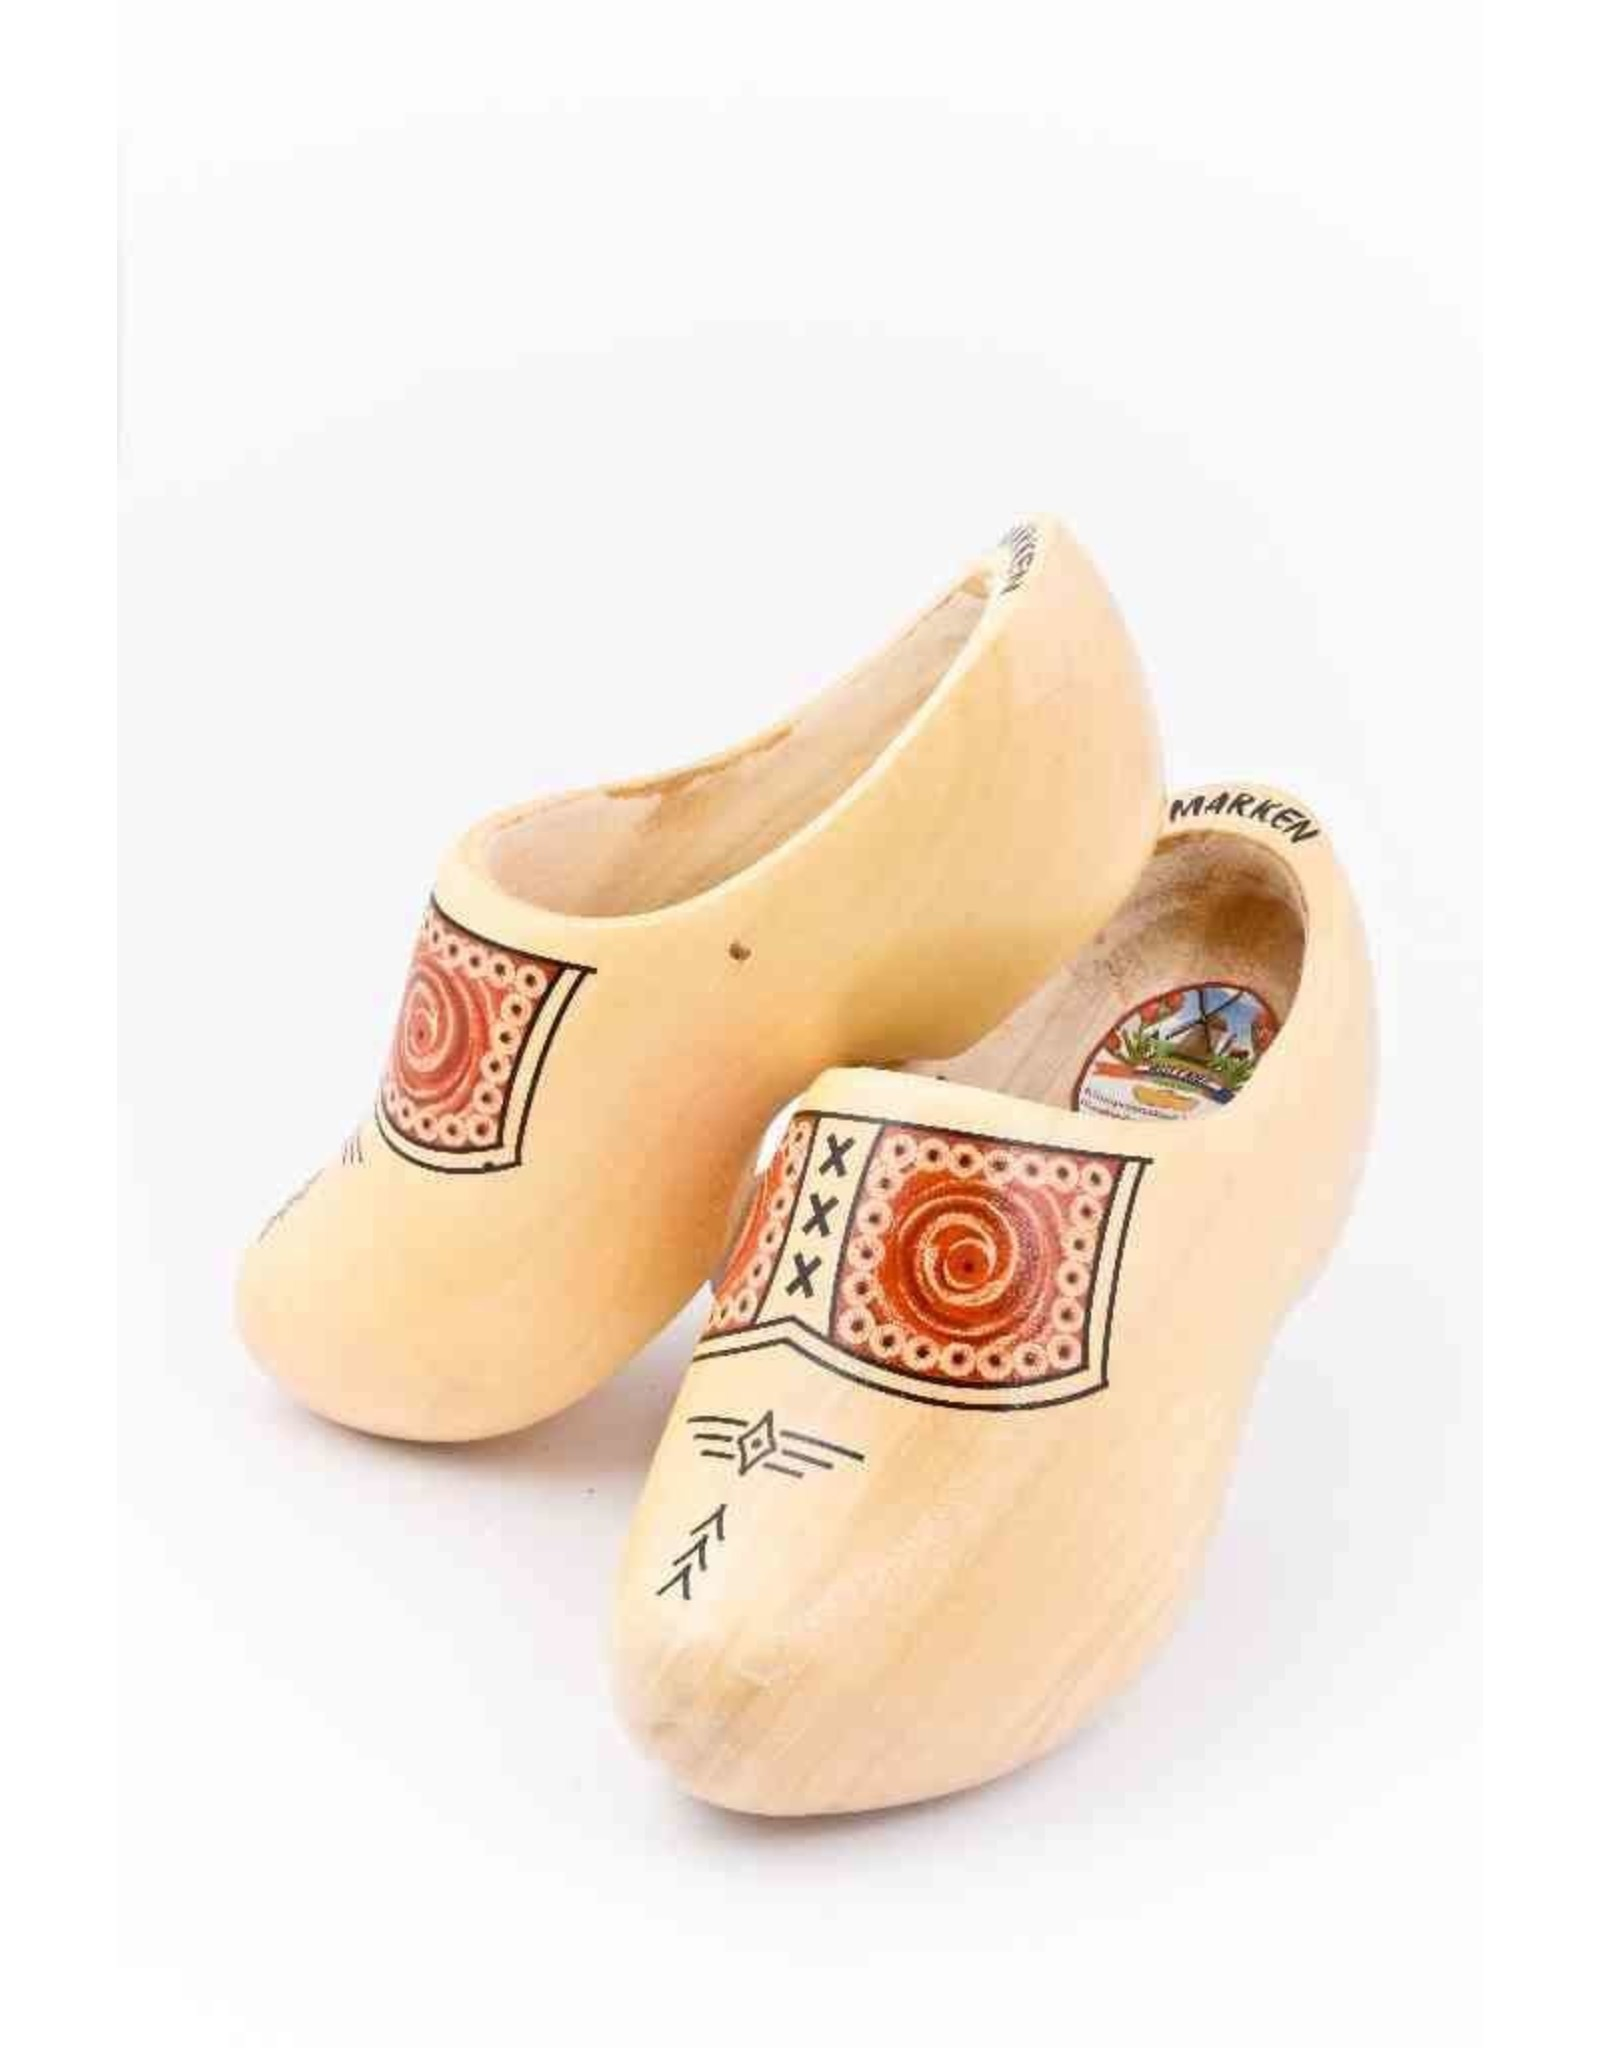 Wooden Shoe Factory Marken Wooden Shoes, Traditional Design